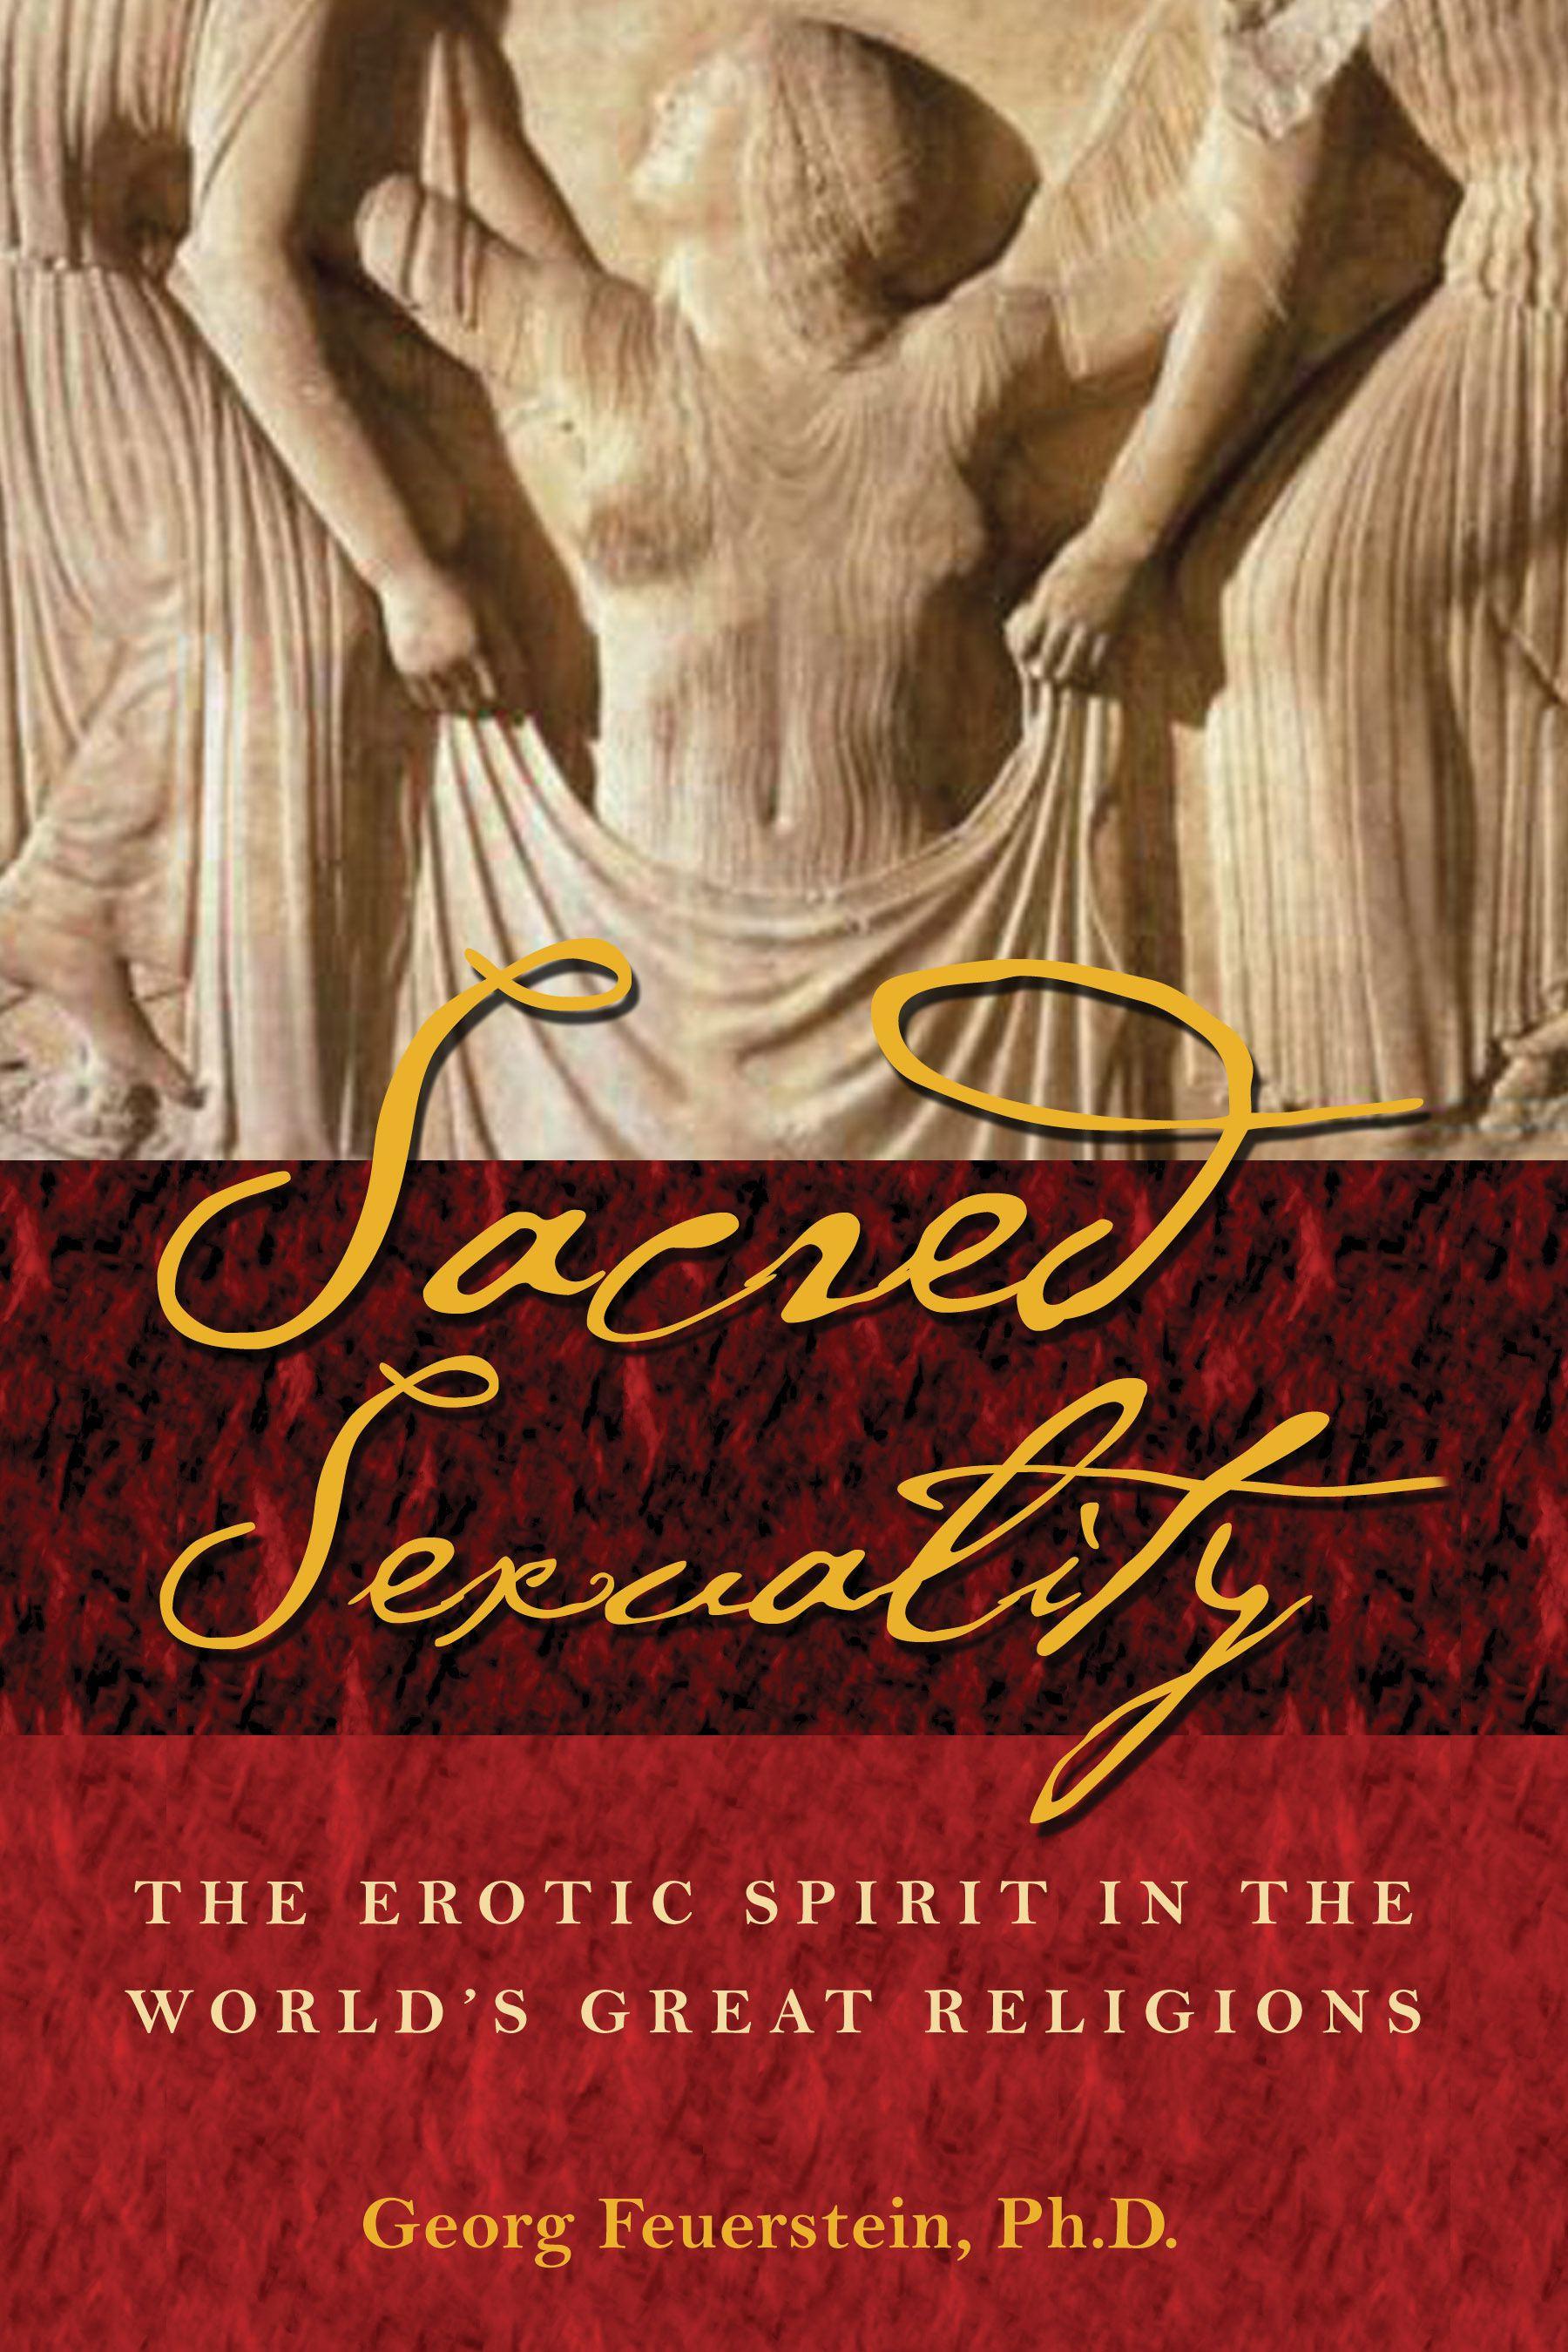 Sacred sexuality 9780892811267 hr